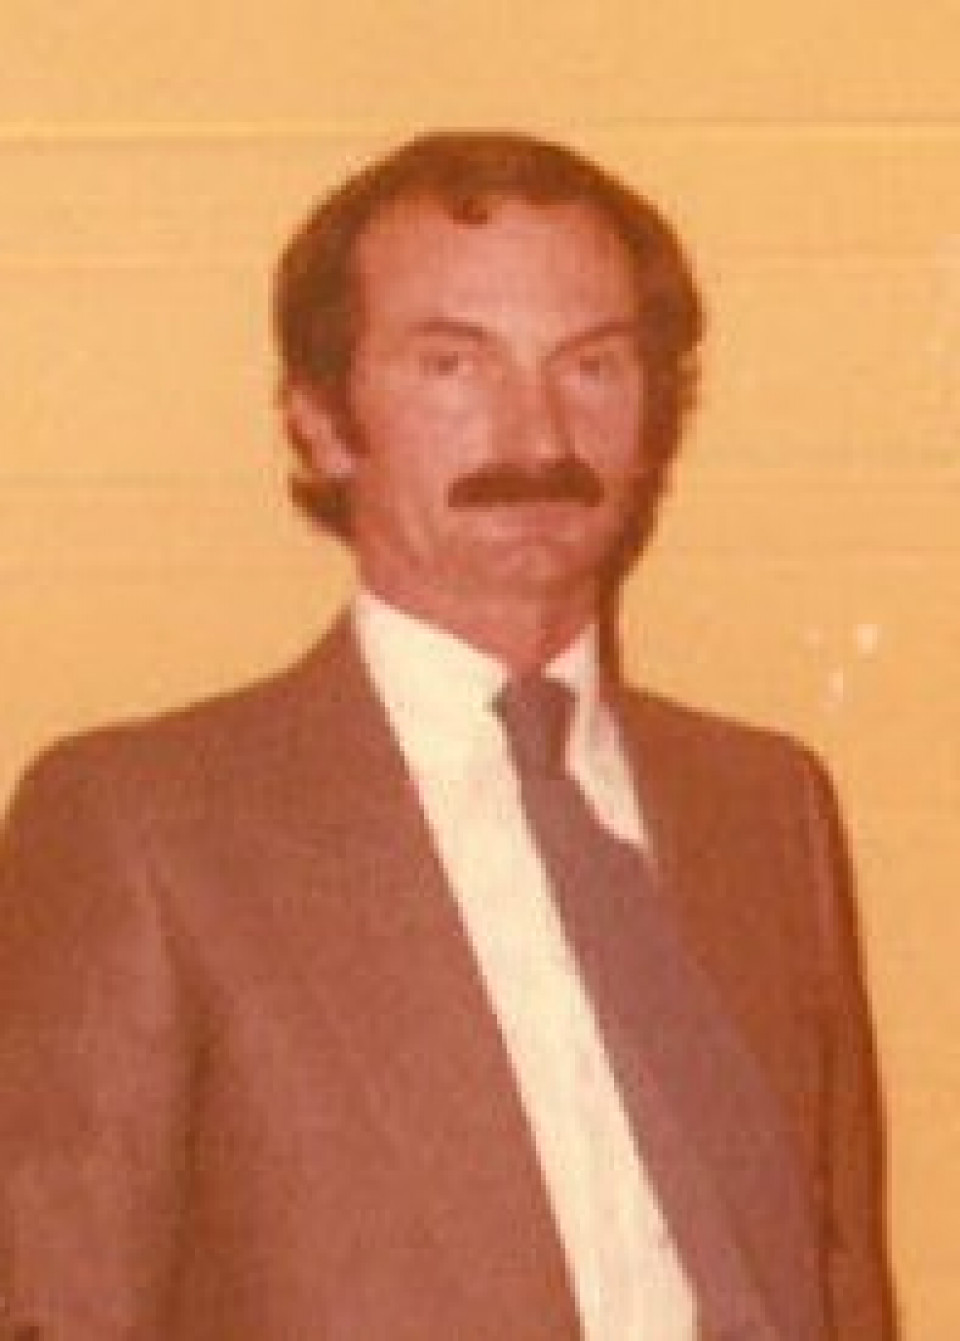 Adalberto Benuzzi, Presidente dell'UP dal 1988 al 1993